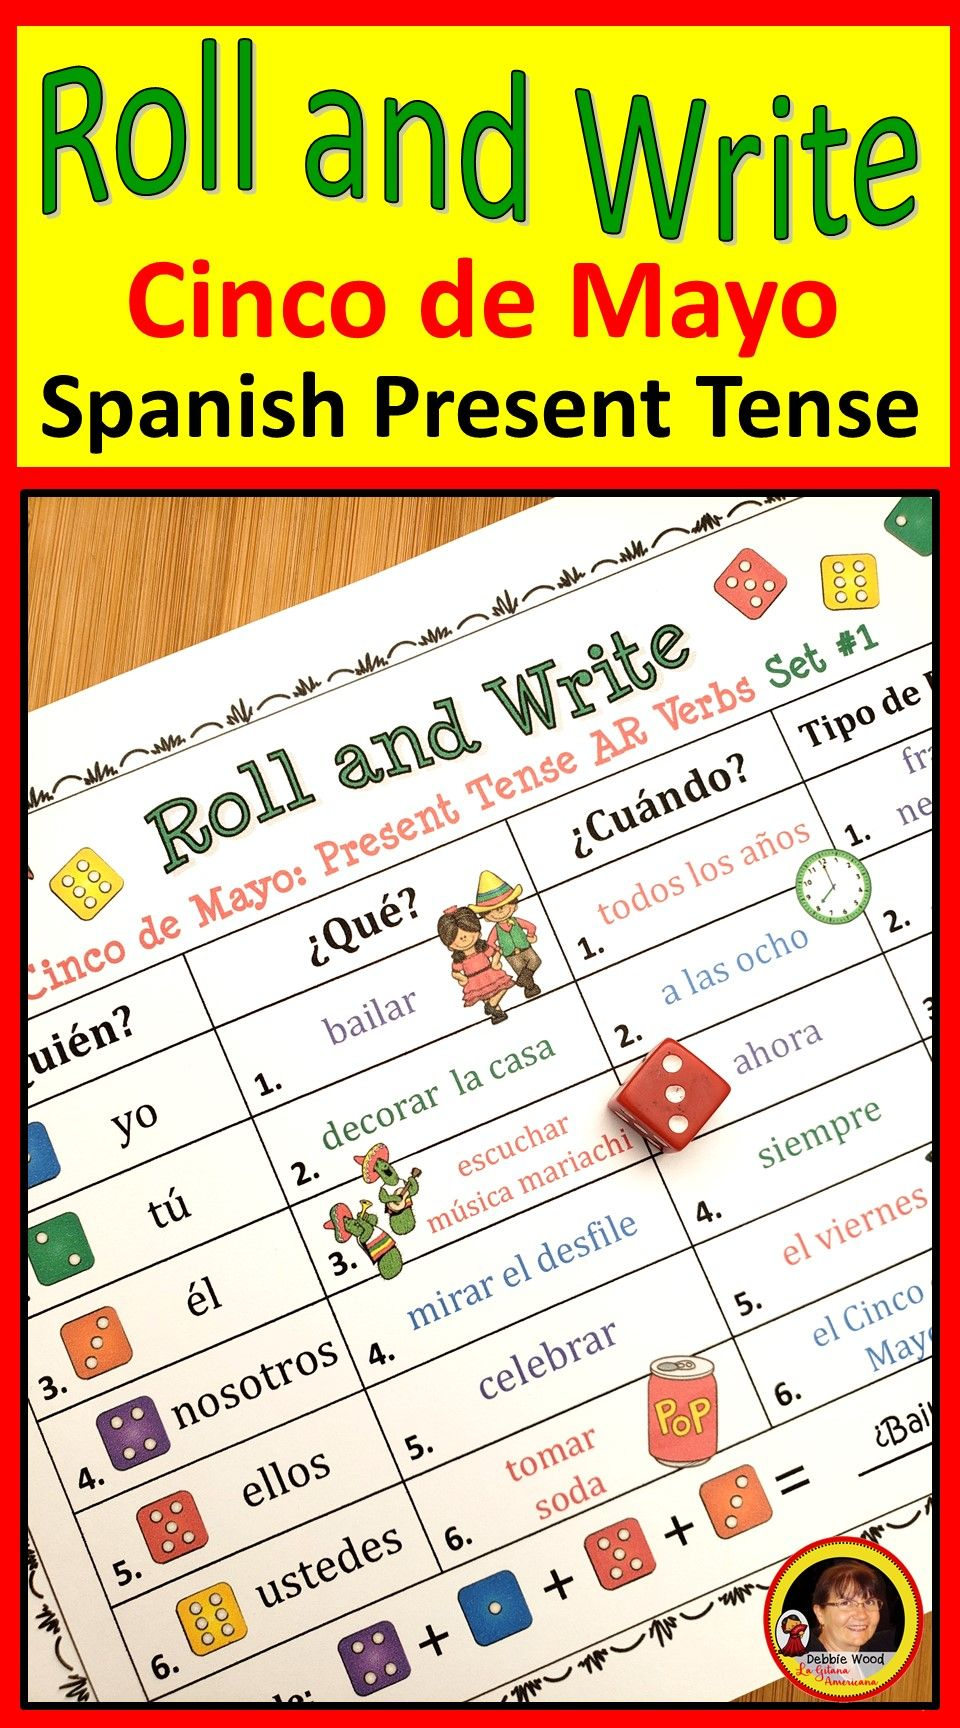 Spanish Cinco De Mayo Activities Spanish Present Tense Verbs Language Class Learning Spanish Spanish Lesson Plans [ 1728 x 960 Pixel ]